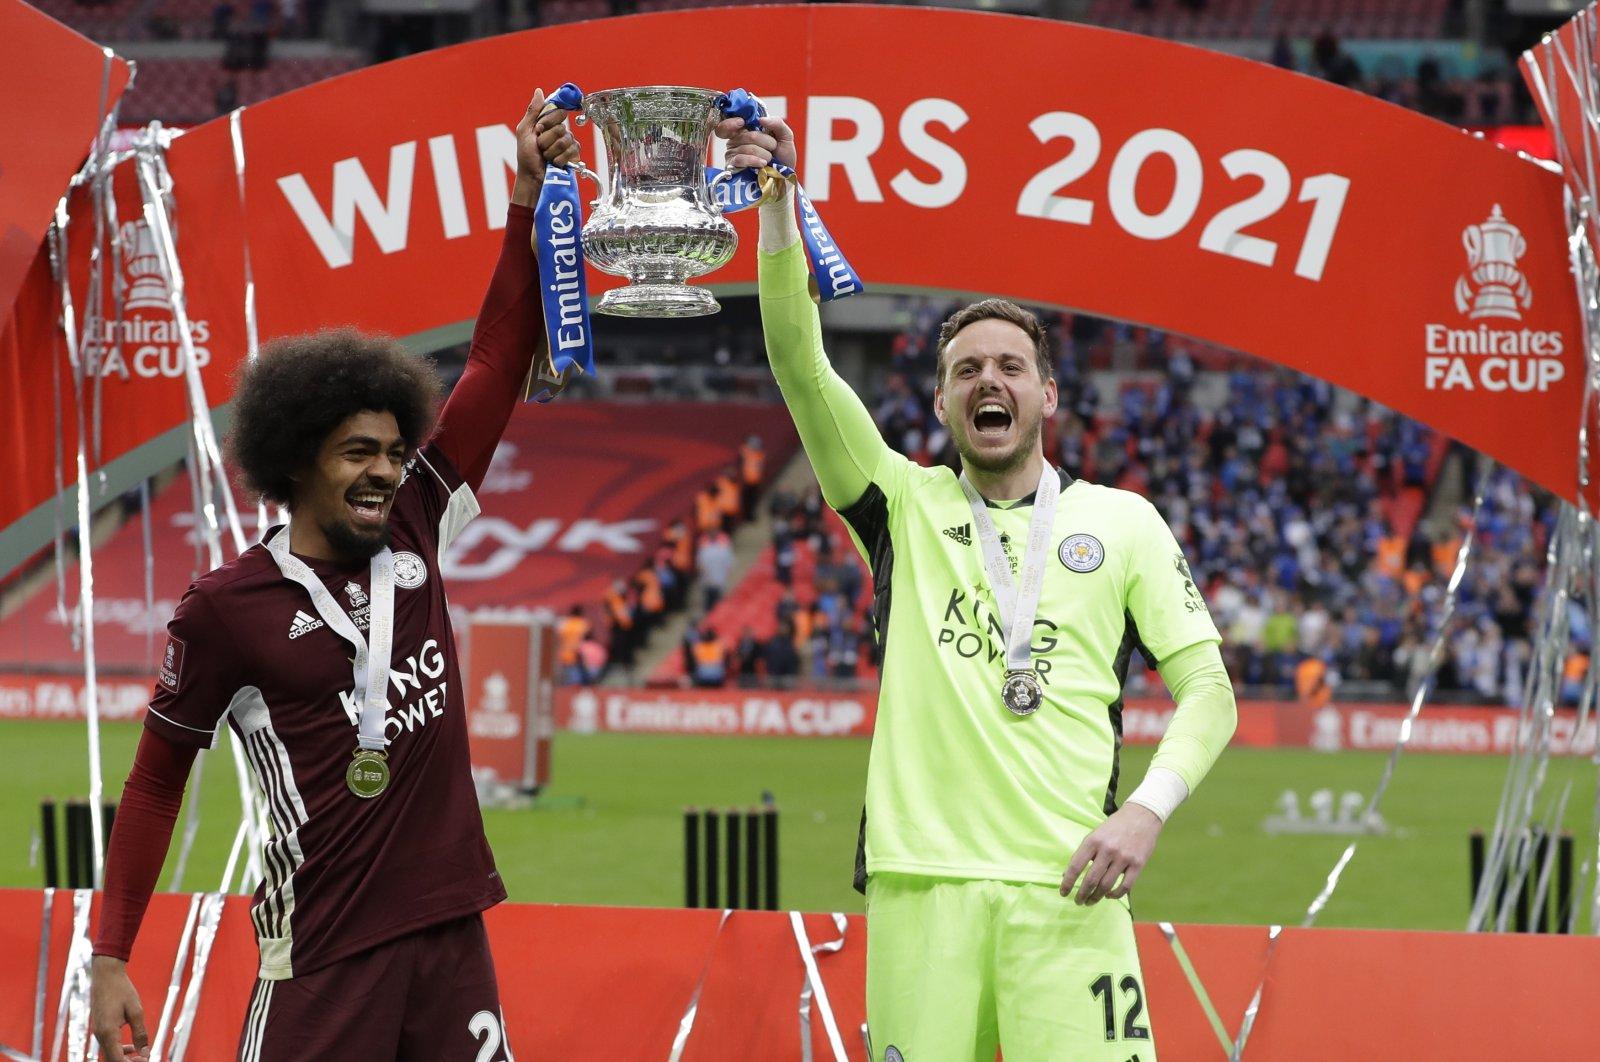 Leicester's Hamza Choudhury (L) and goalkeeper Danny Ward (R) winning the English FA Cup at the Wembley Stadium, London, Britain, May 15, 2021. (EPA Photo)